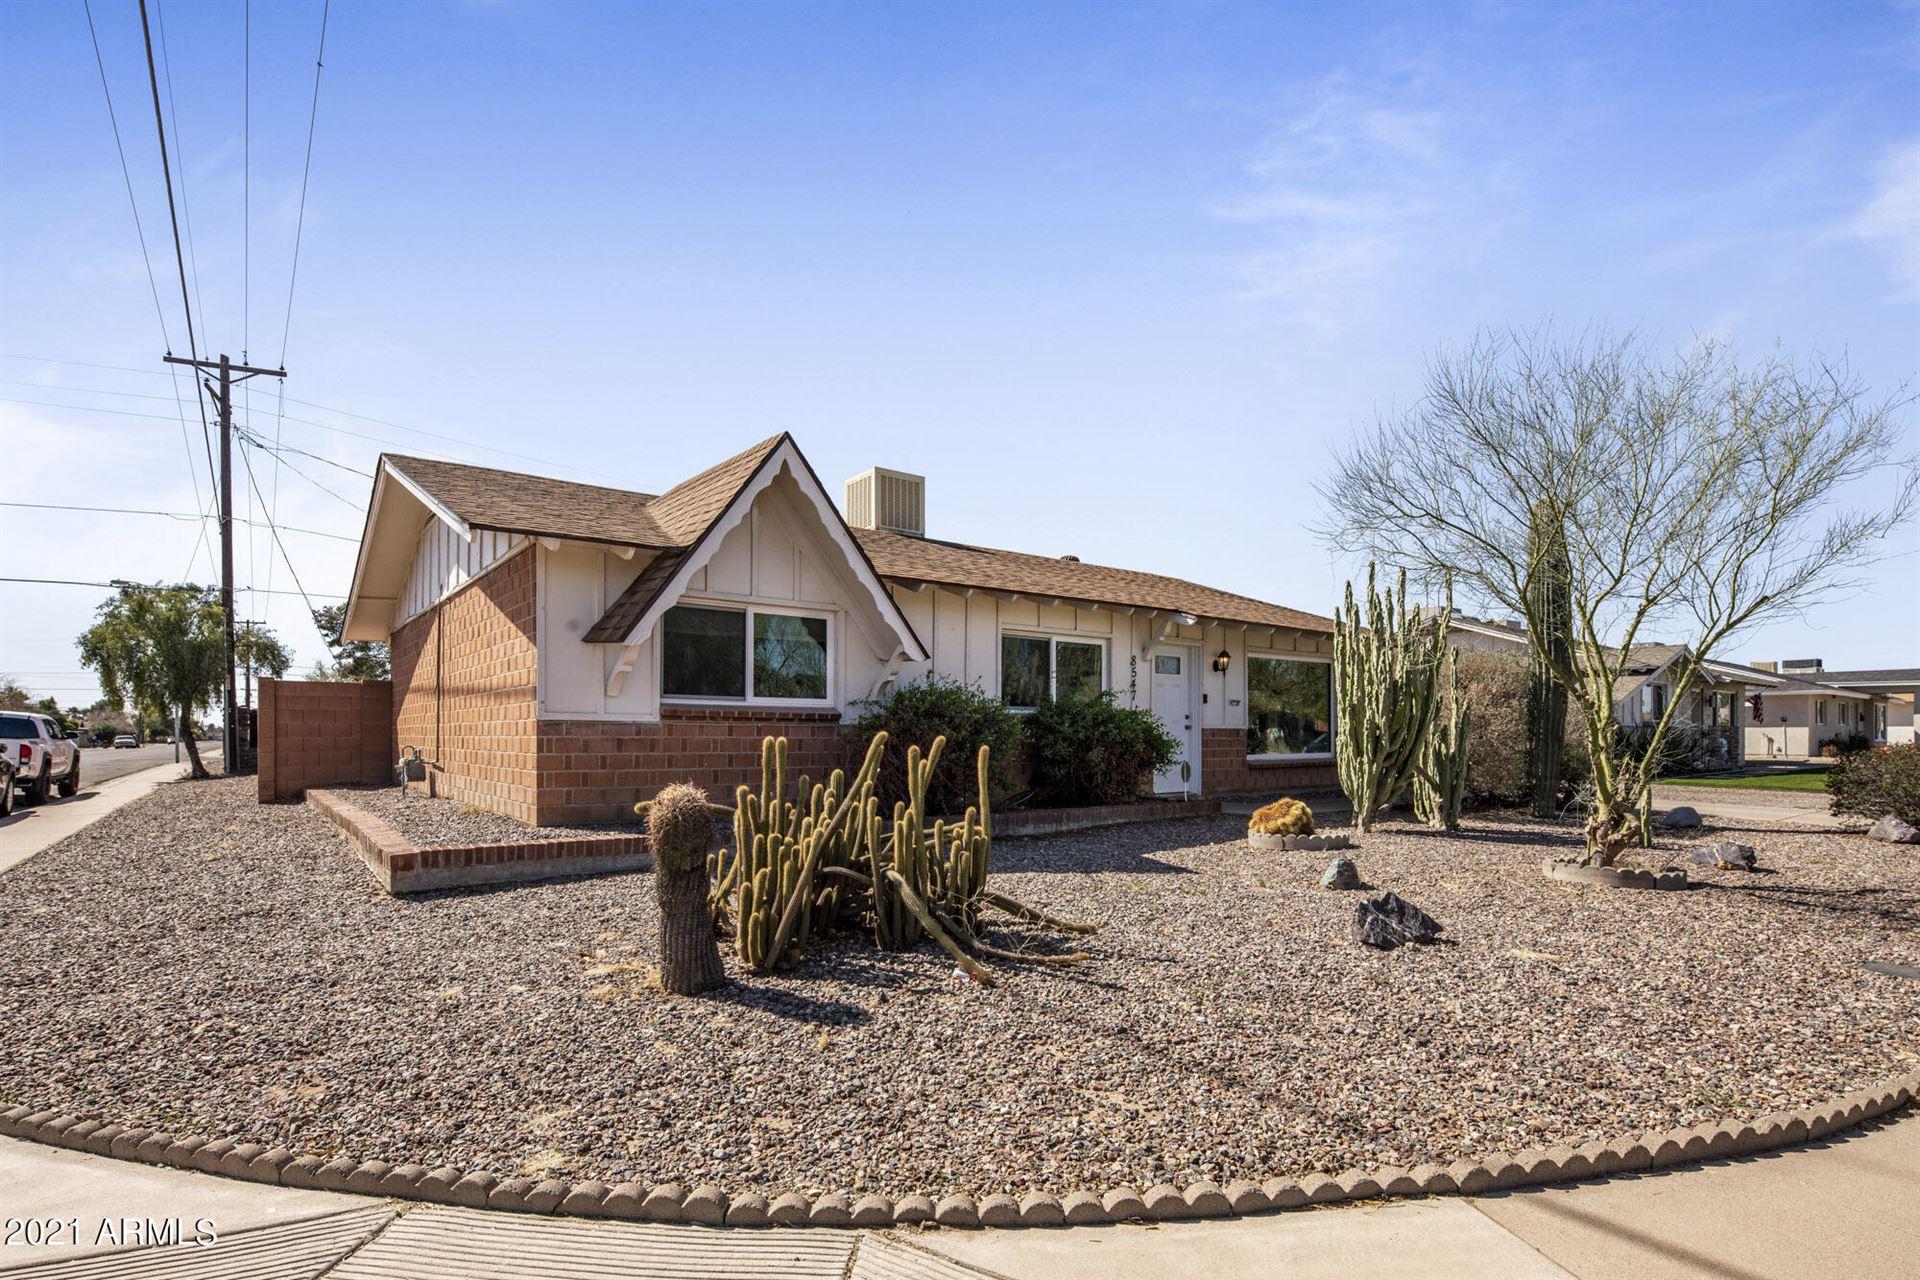 Photo of 8547 E ROANOKE Avenue, Scottsdale, AZ 85257 (MLS # 6201278)